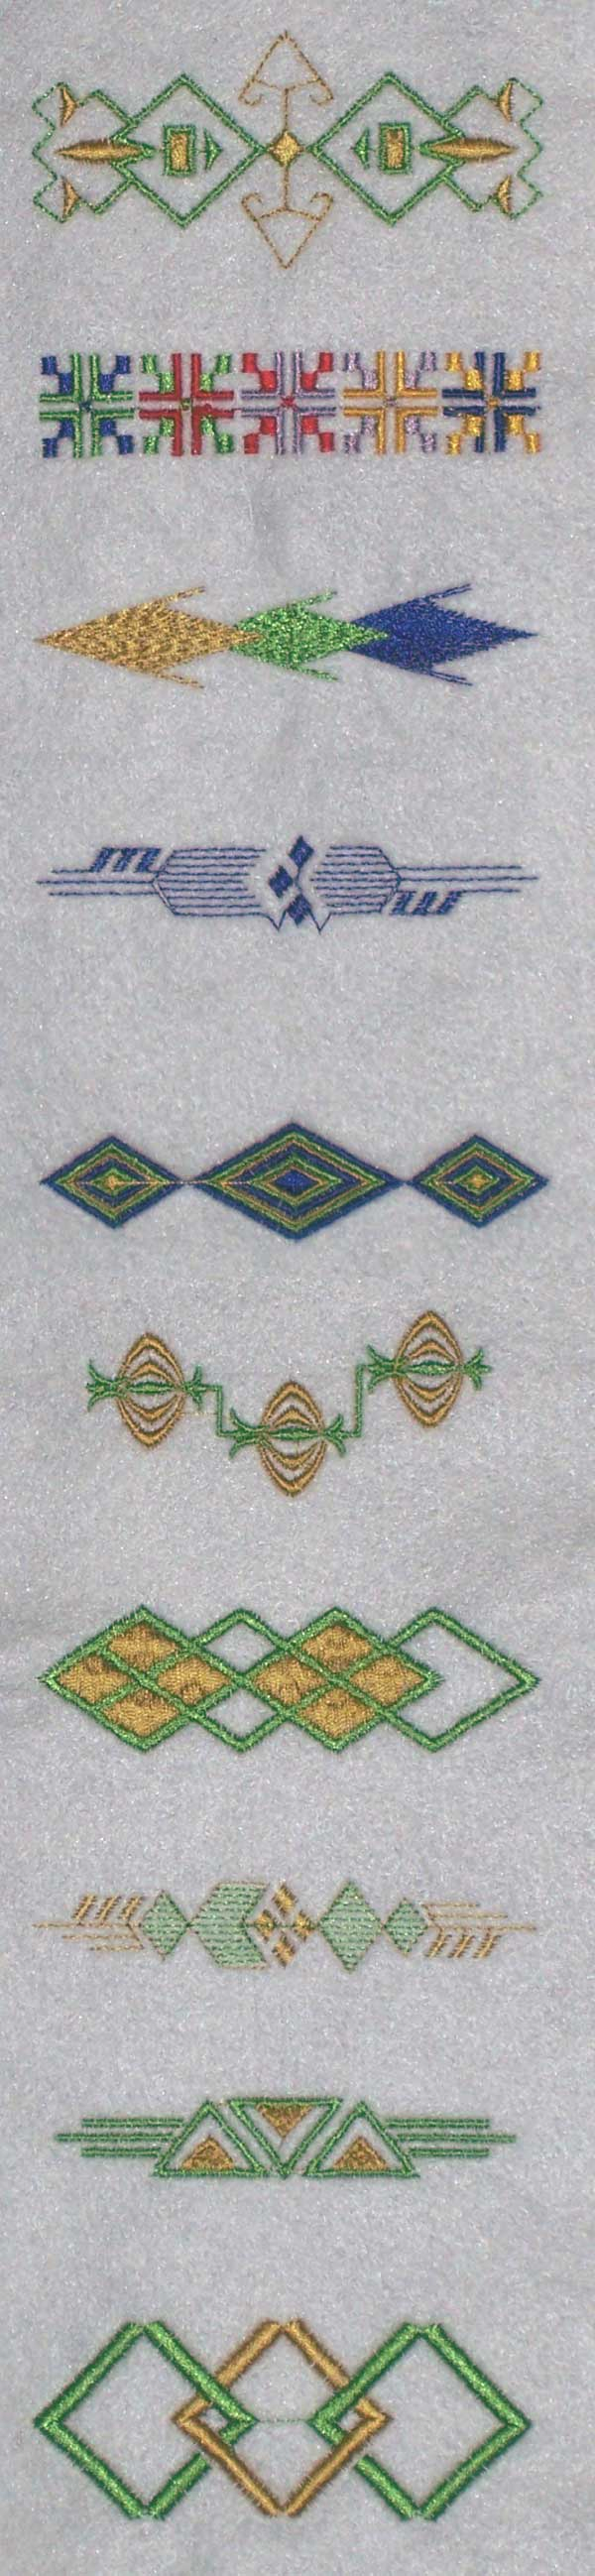 Machine embroidery designs geometric borders set